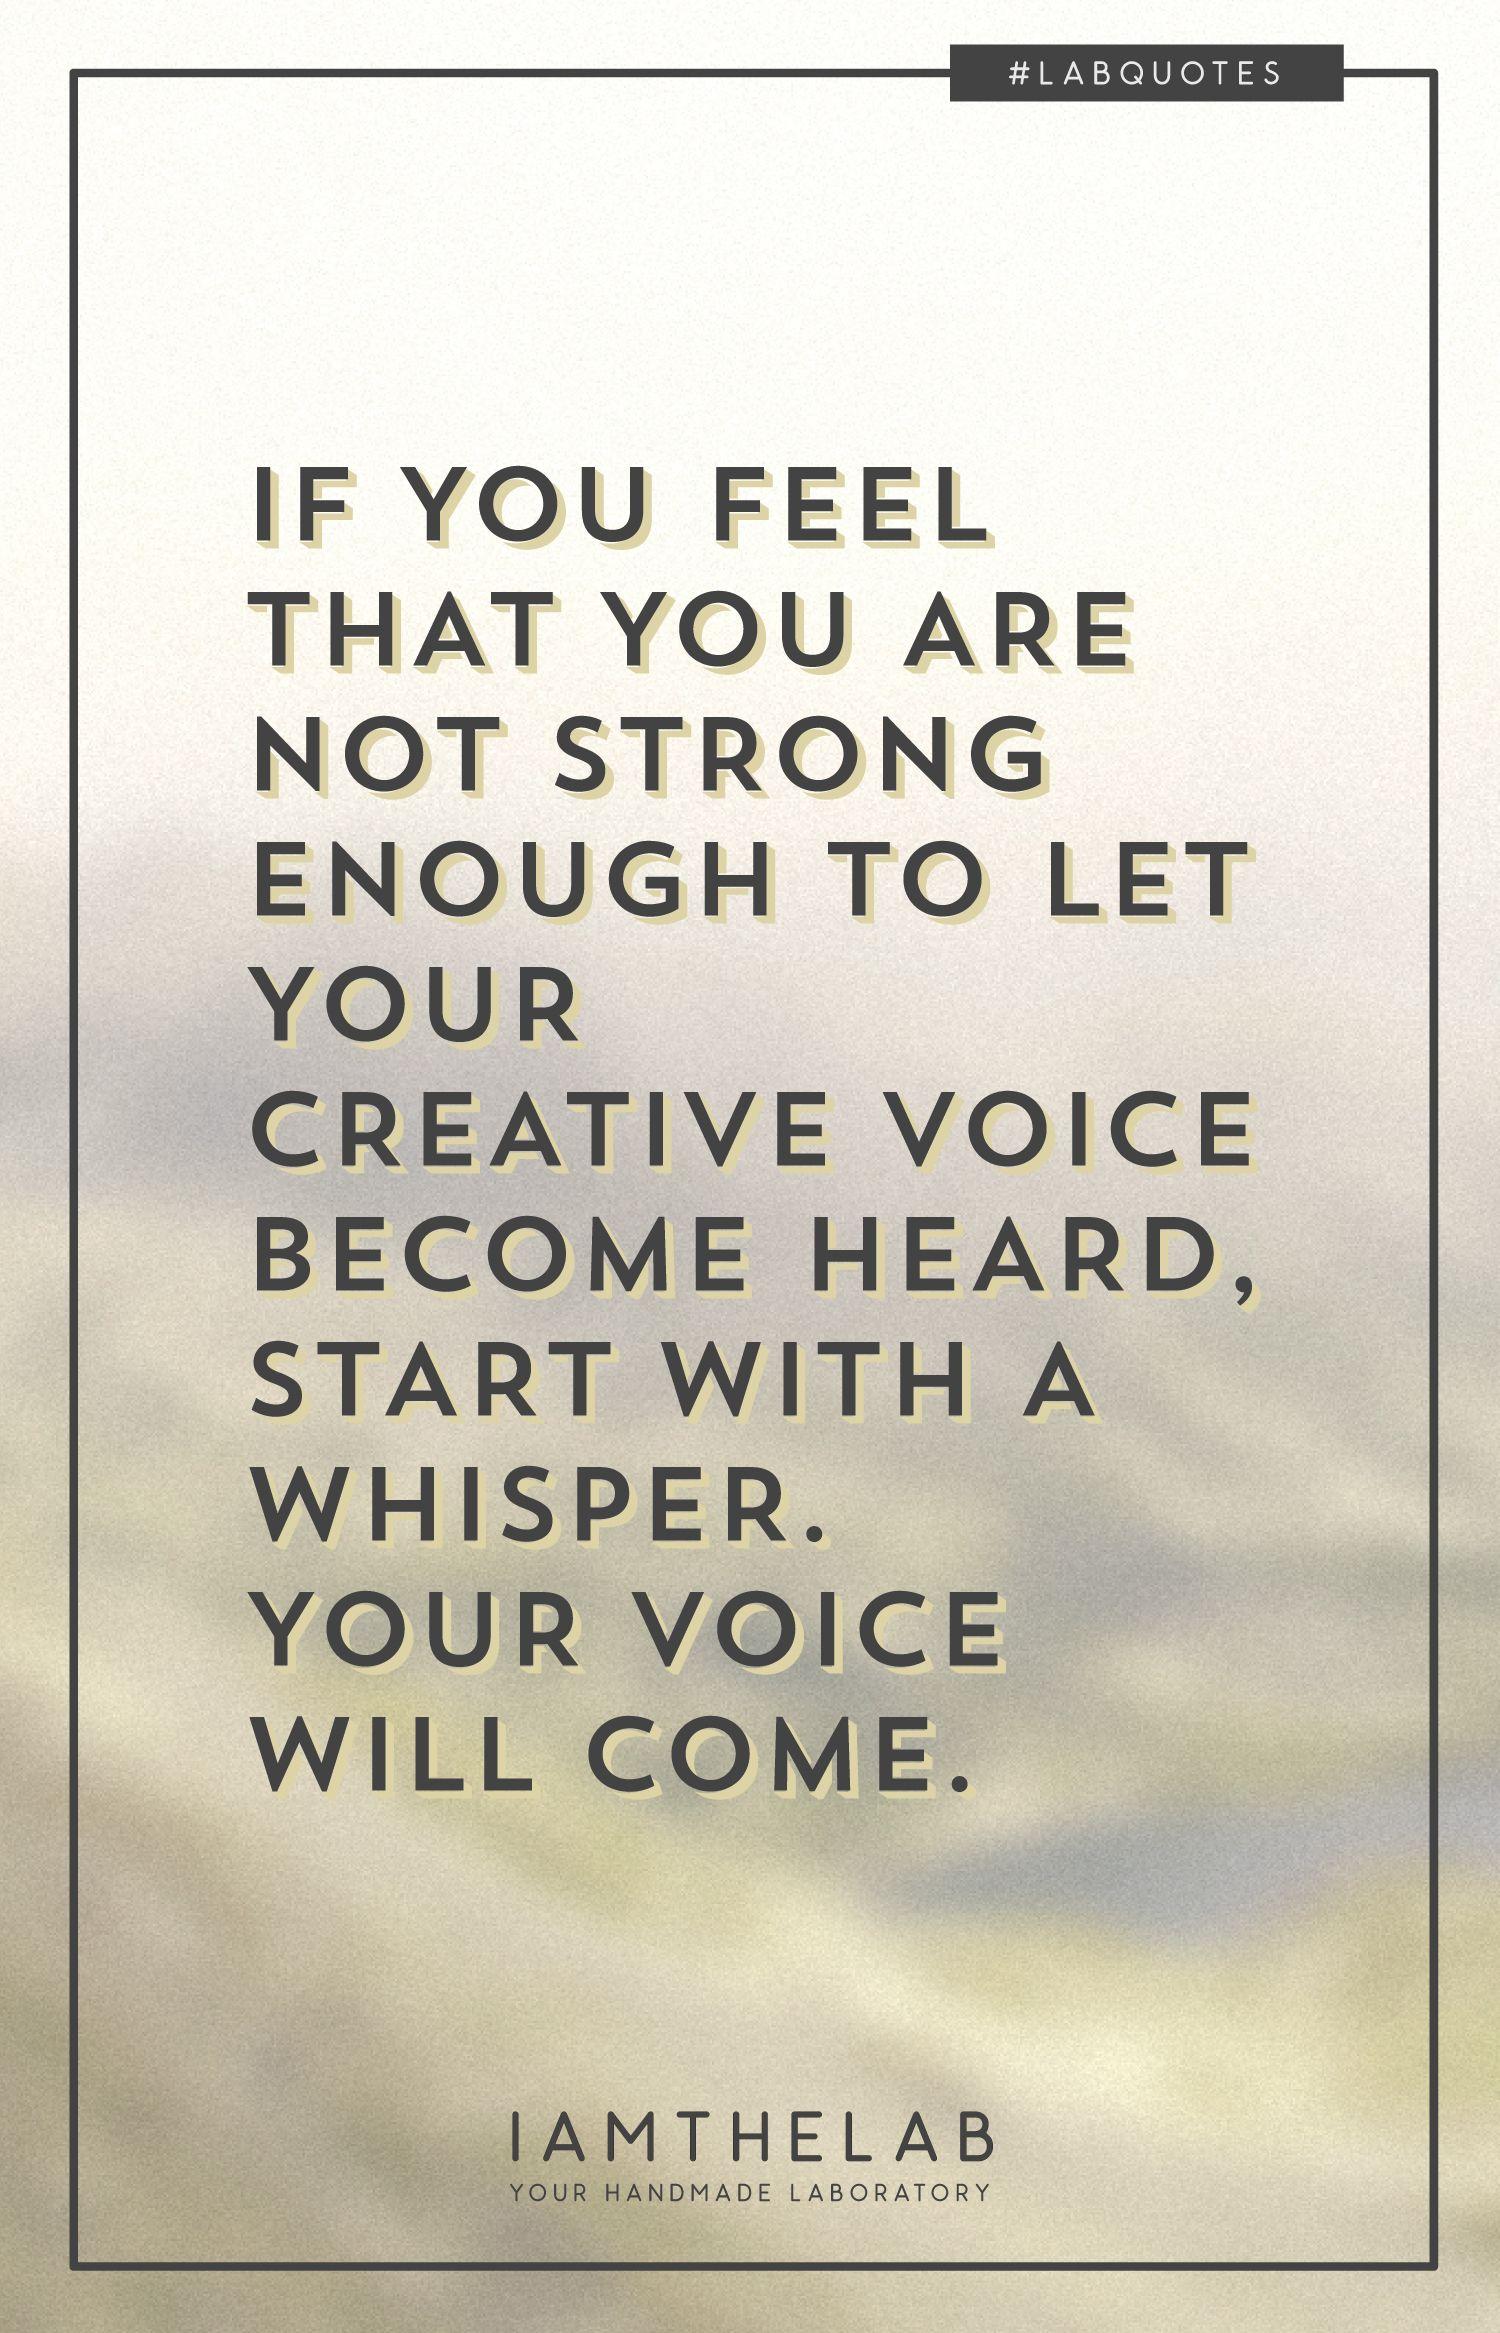 Labquotes 001 Find Your Voice Quotes Motivation Lab Get